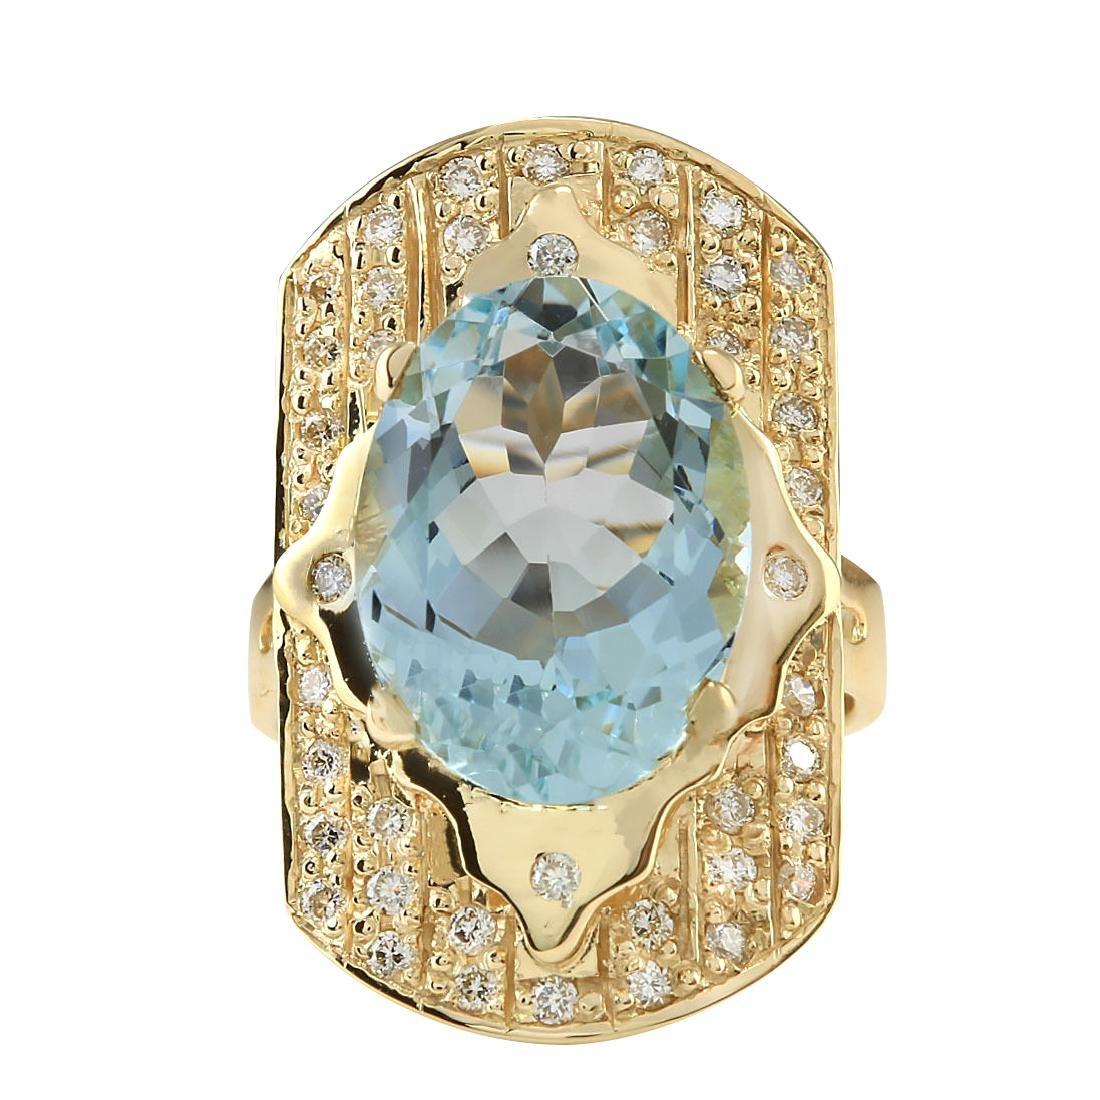 7.35CTW Natural Aquamarine And Diamond Ring In 18K